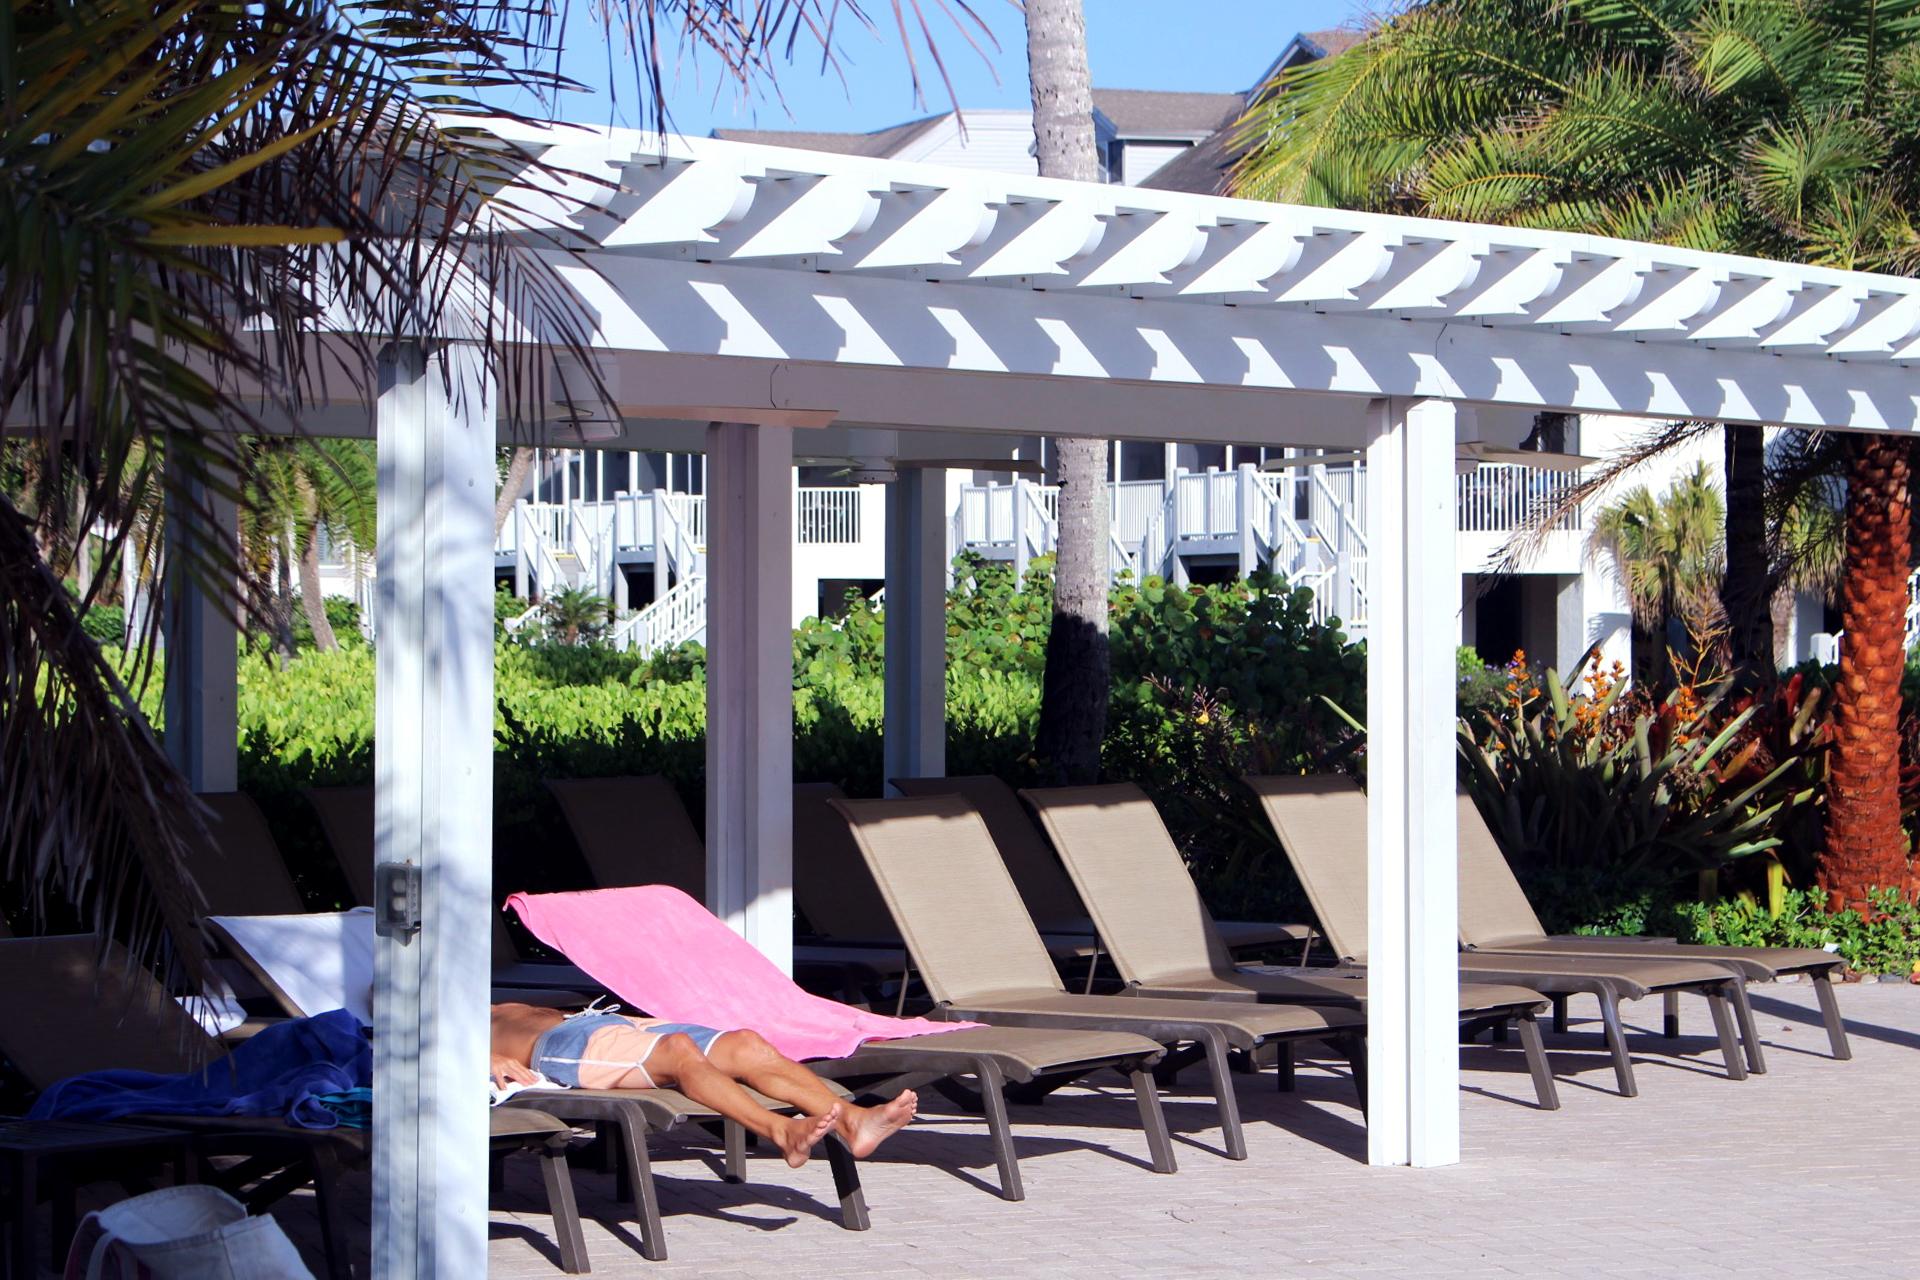 florida-vacation-edit-5.jpg